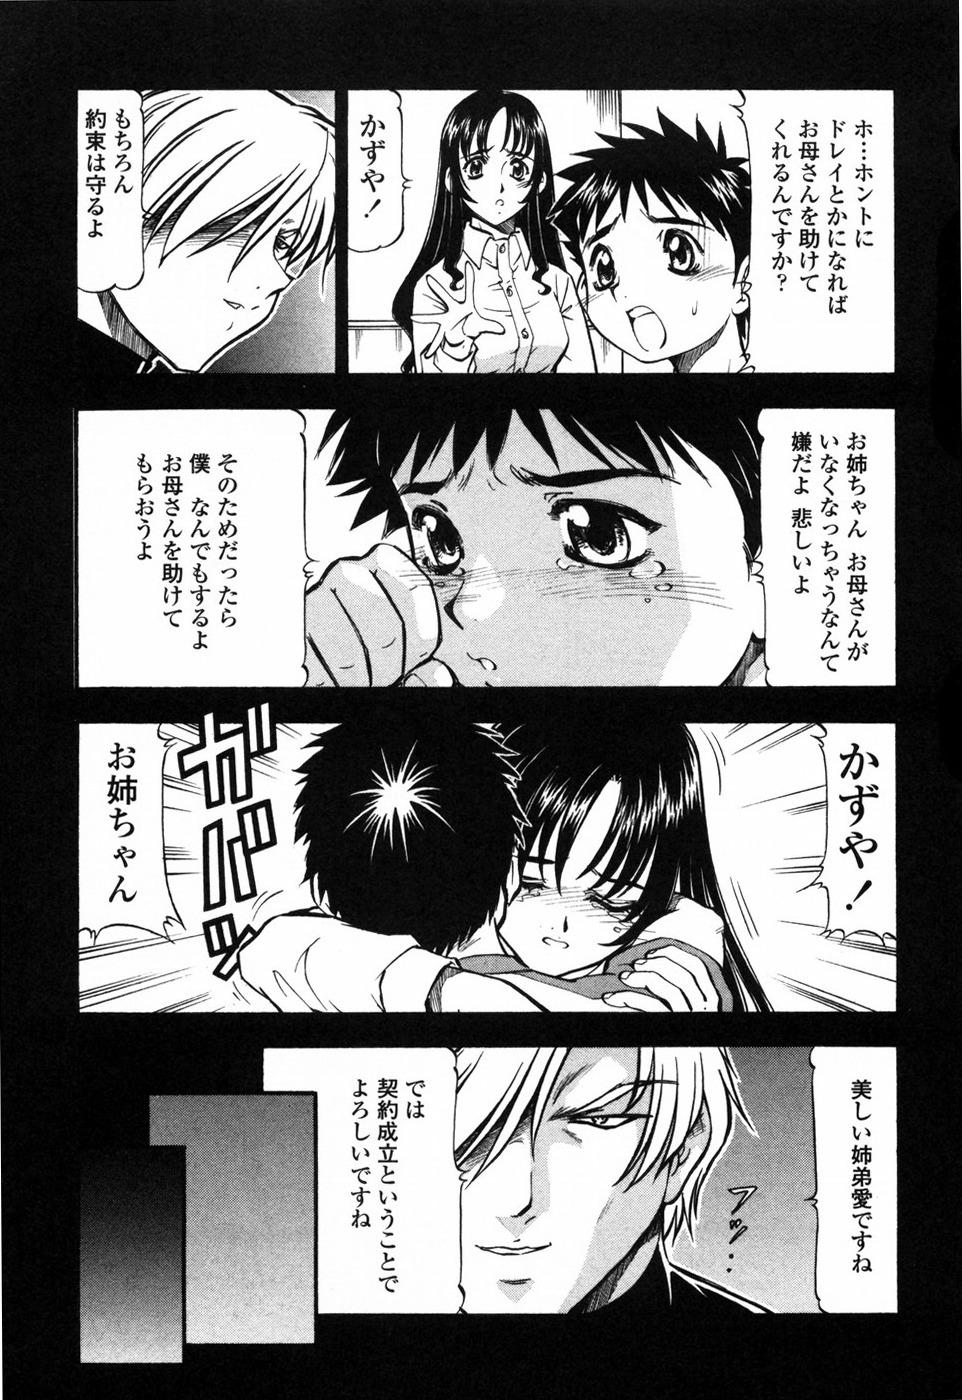 Kichiku Houteishiki - Equation of brutal person 98